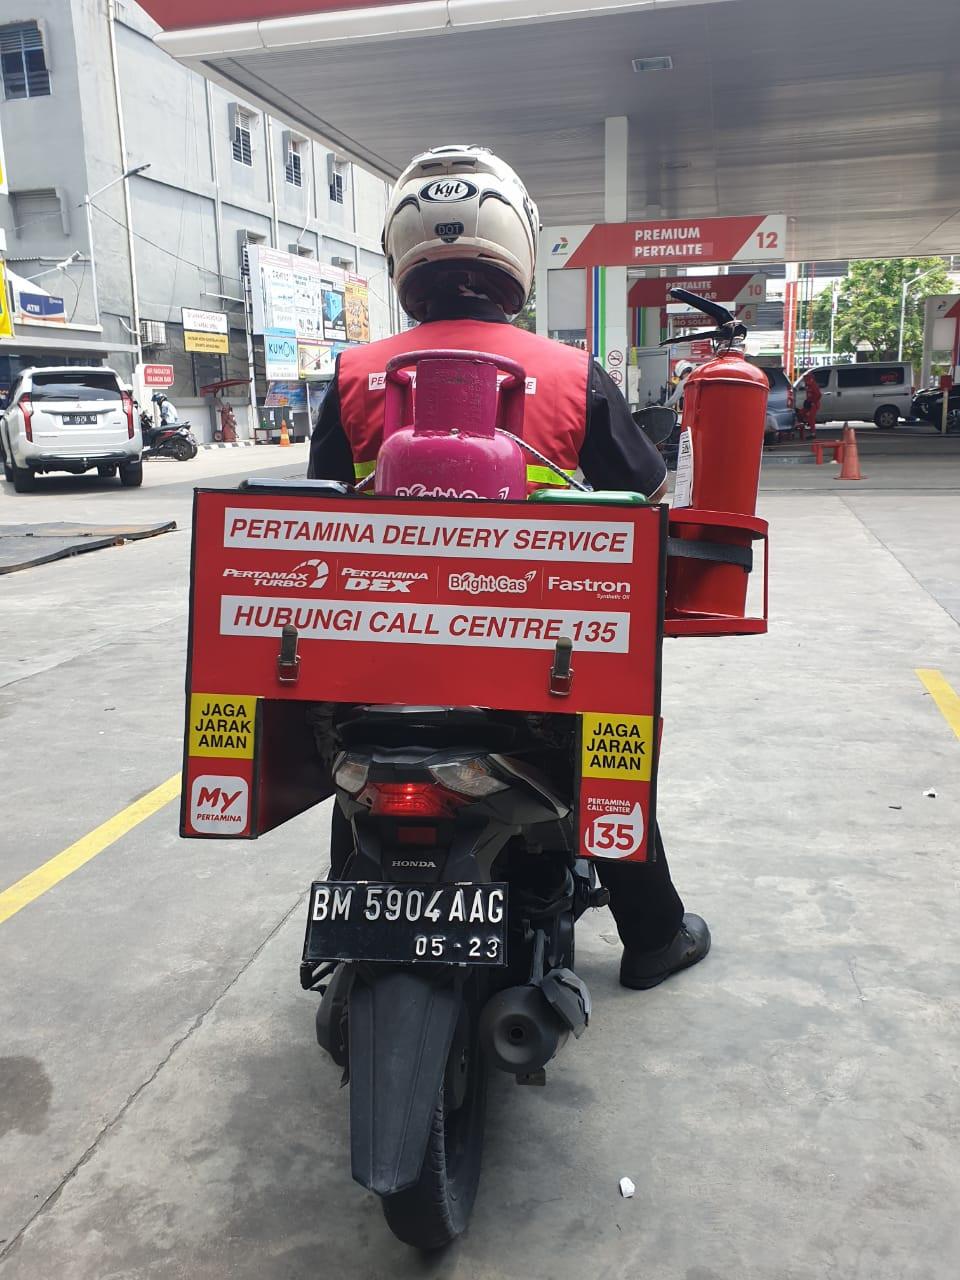 Pertamina, PGN cut revenue targets as weak rupiah, lockdown severely hurt businesses